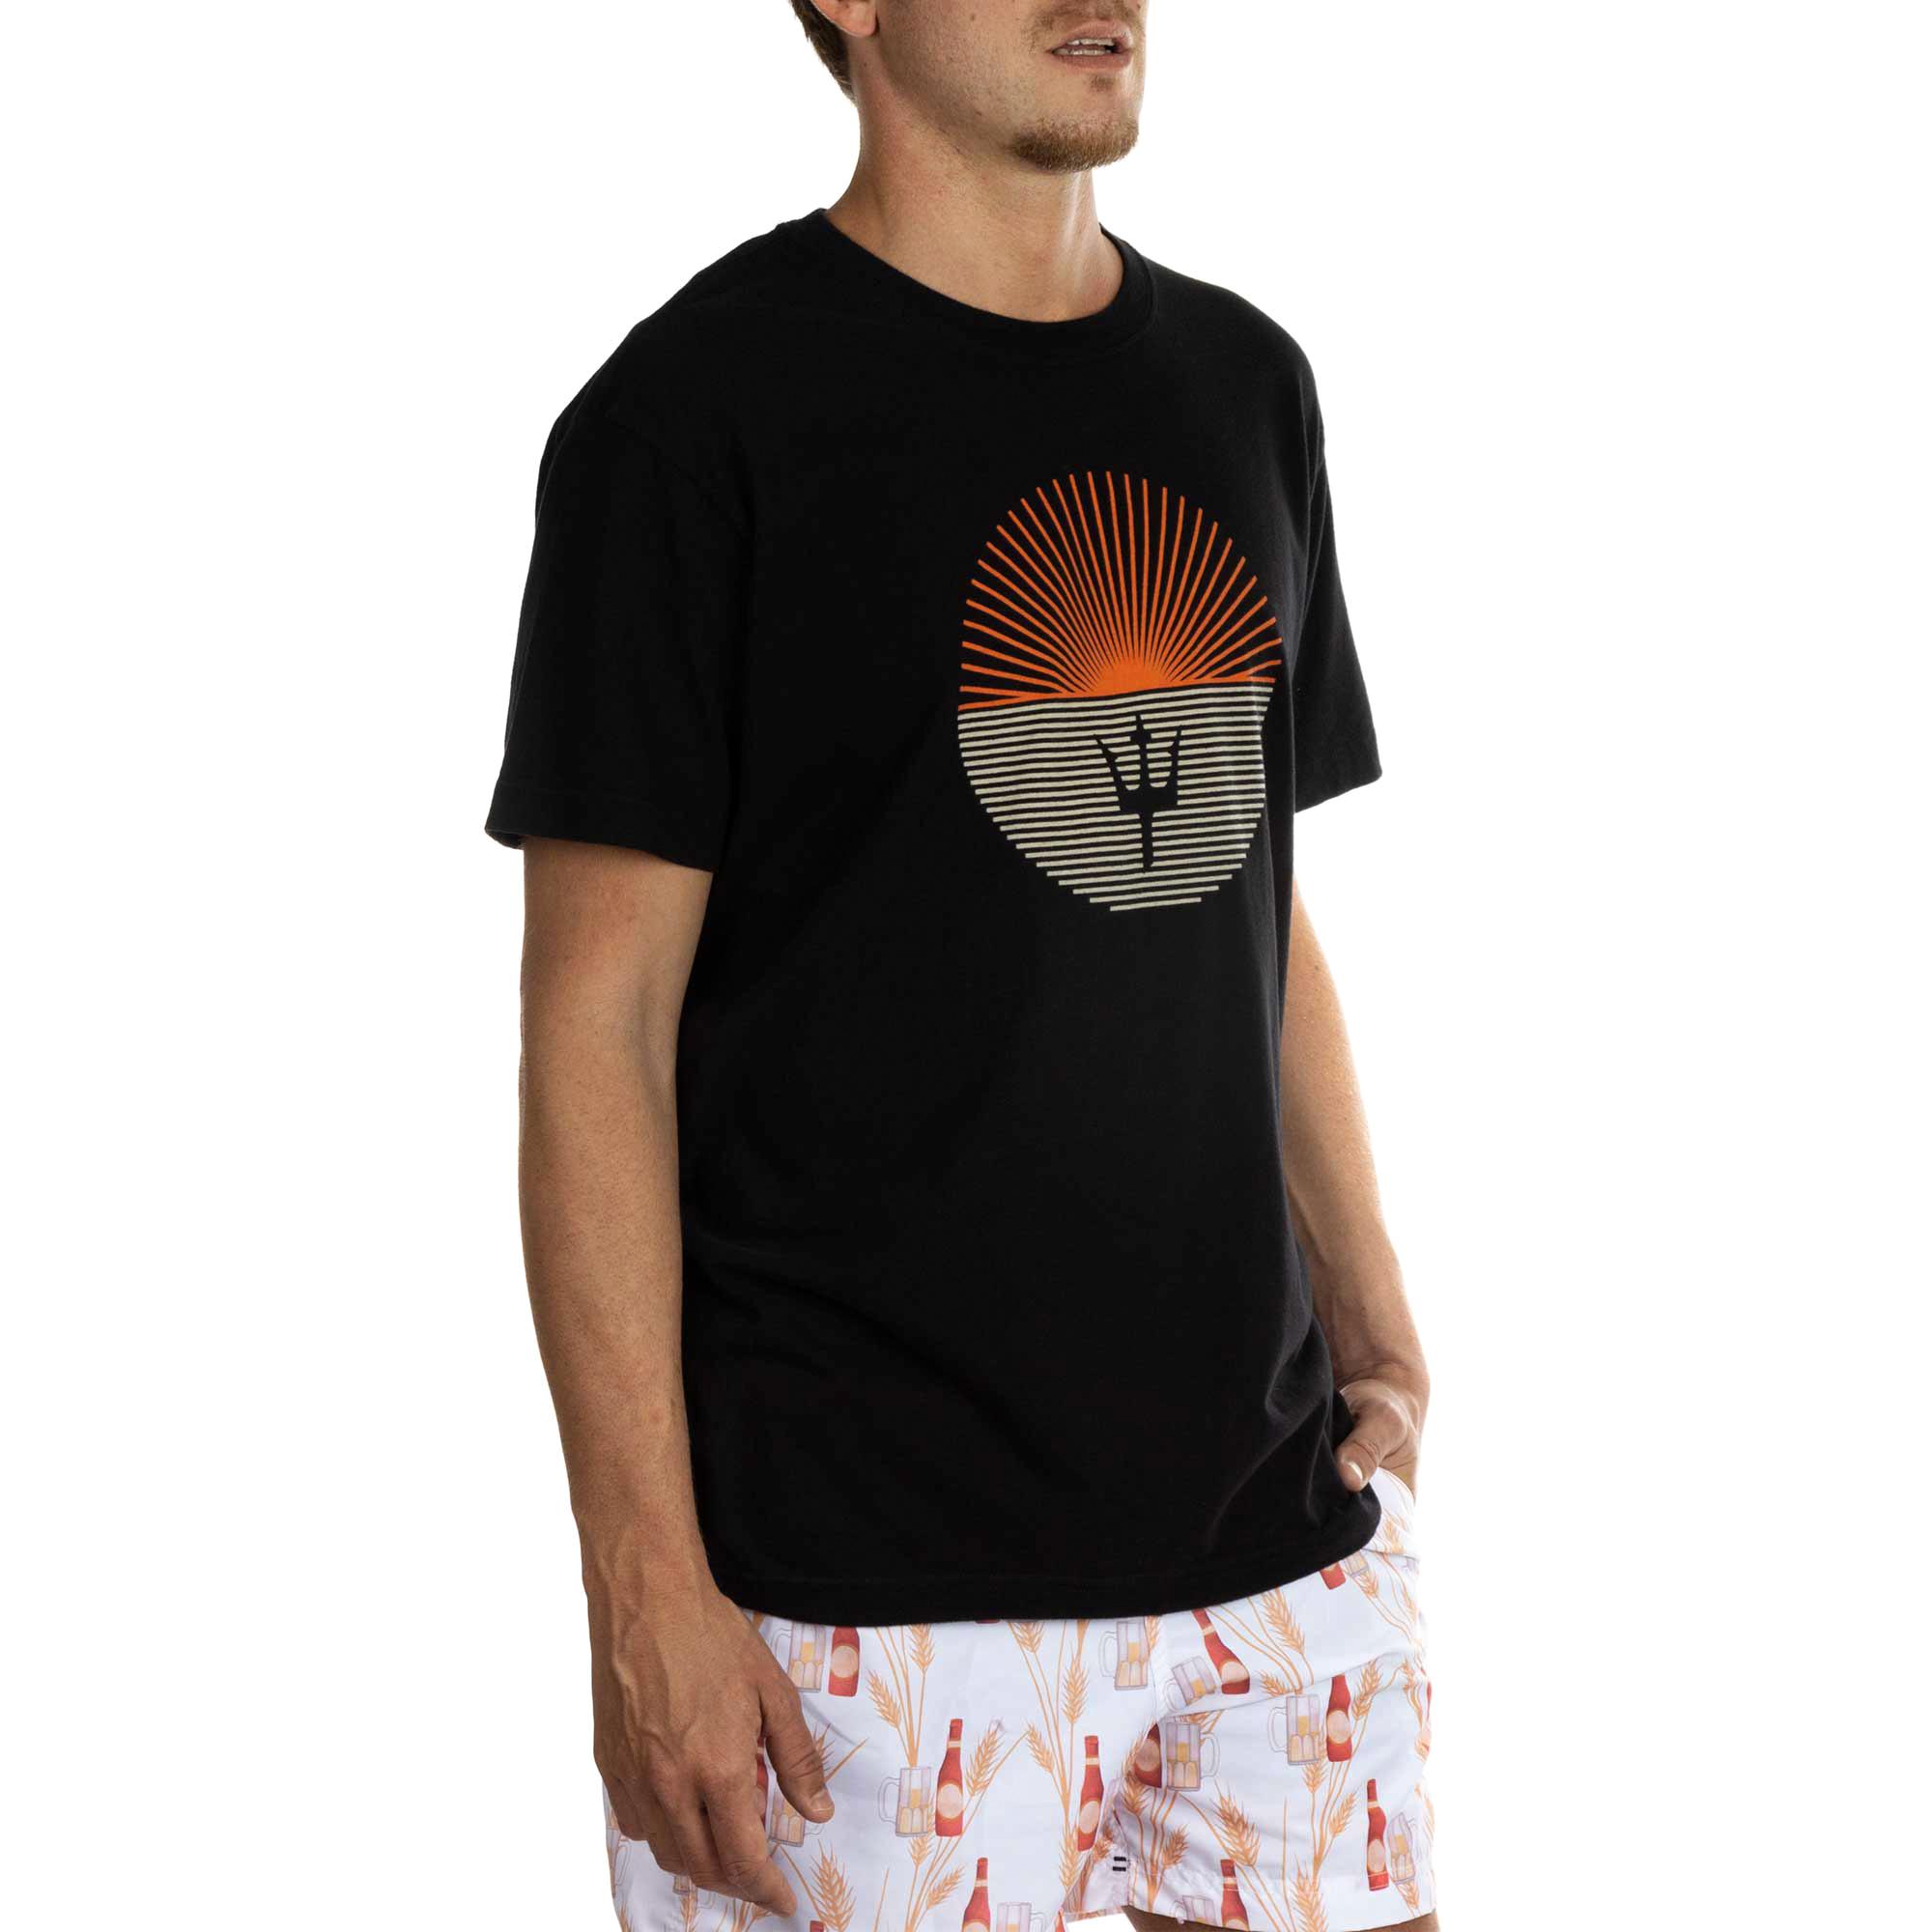 Osklen Camiseta Vintage Sun Listras Manga Curta Masculino Preto